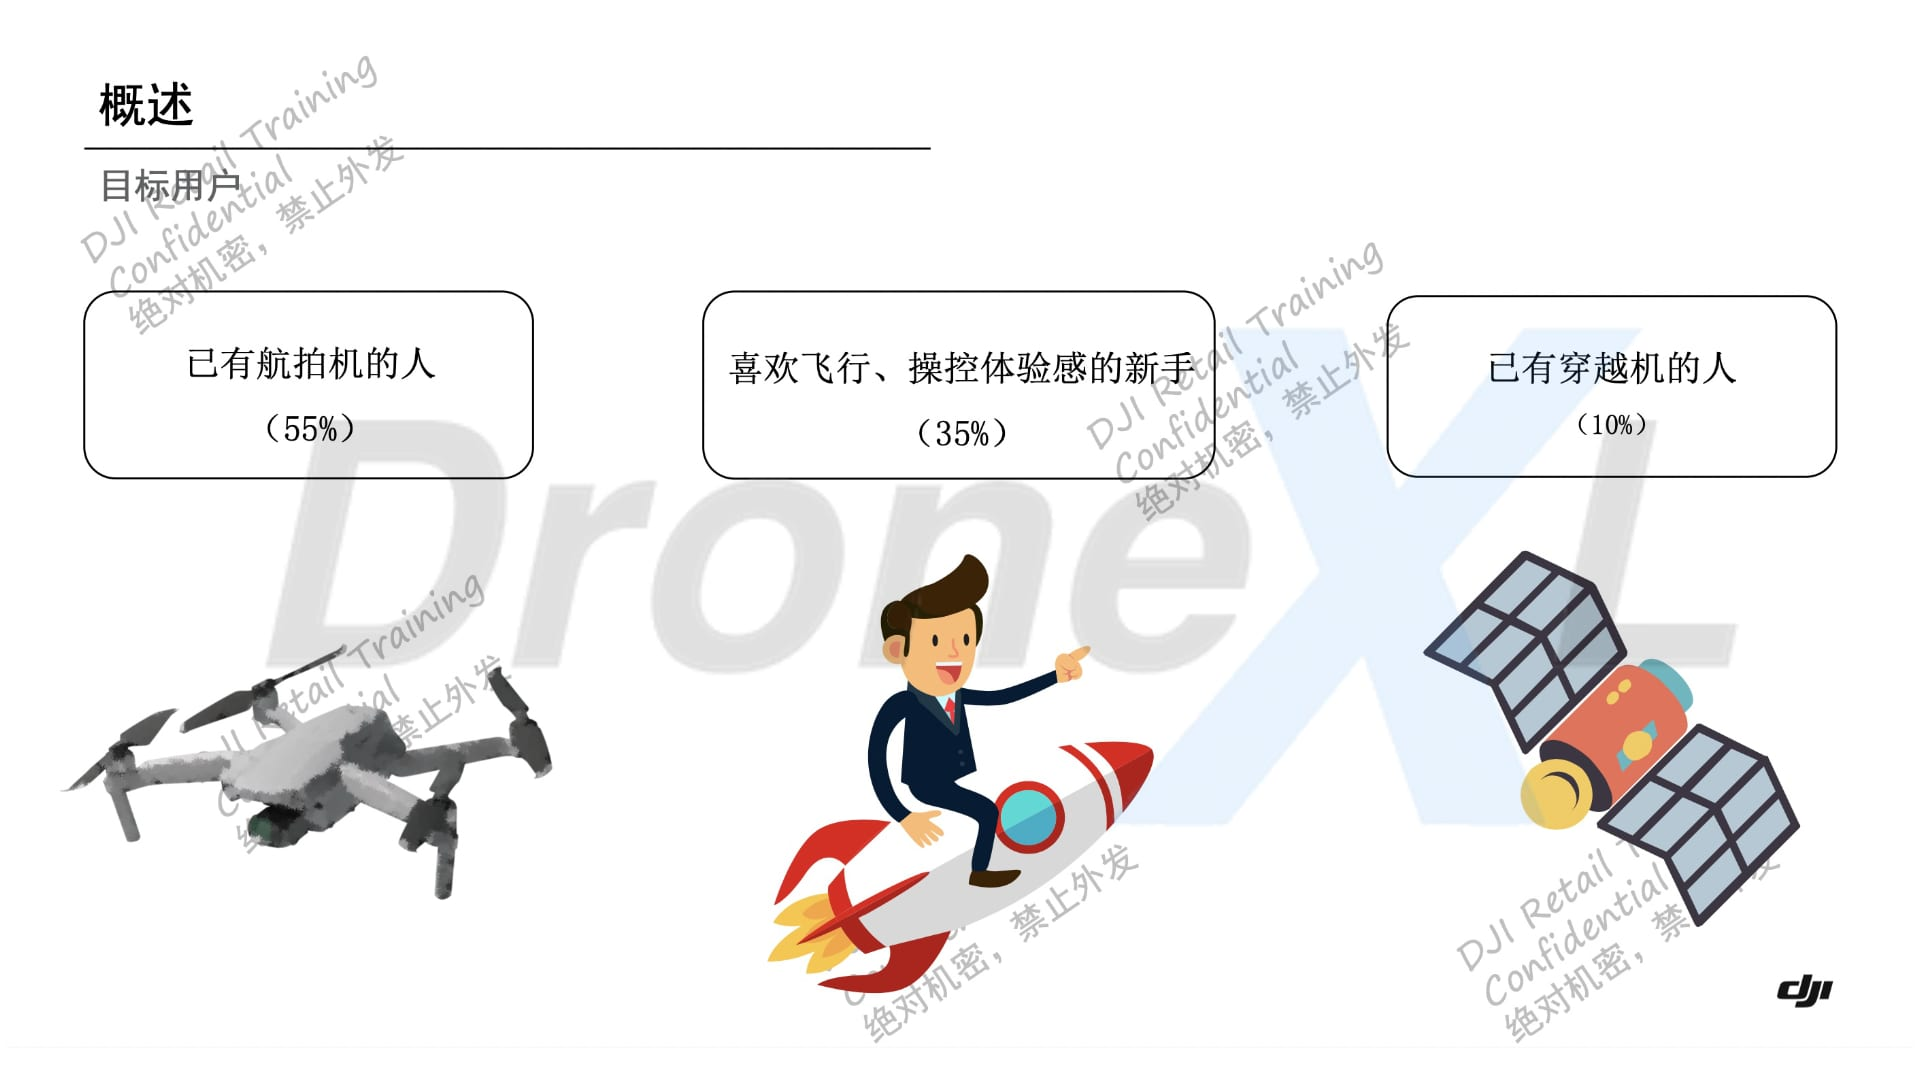 DJI FPV drone 60-page pdf file leaked online